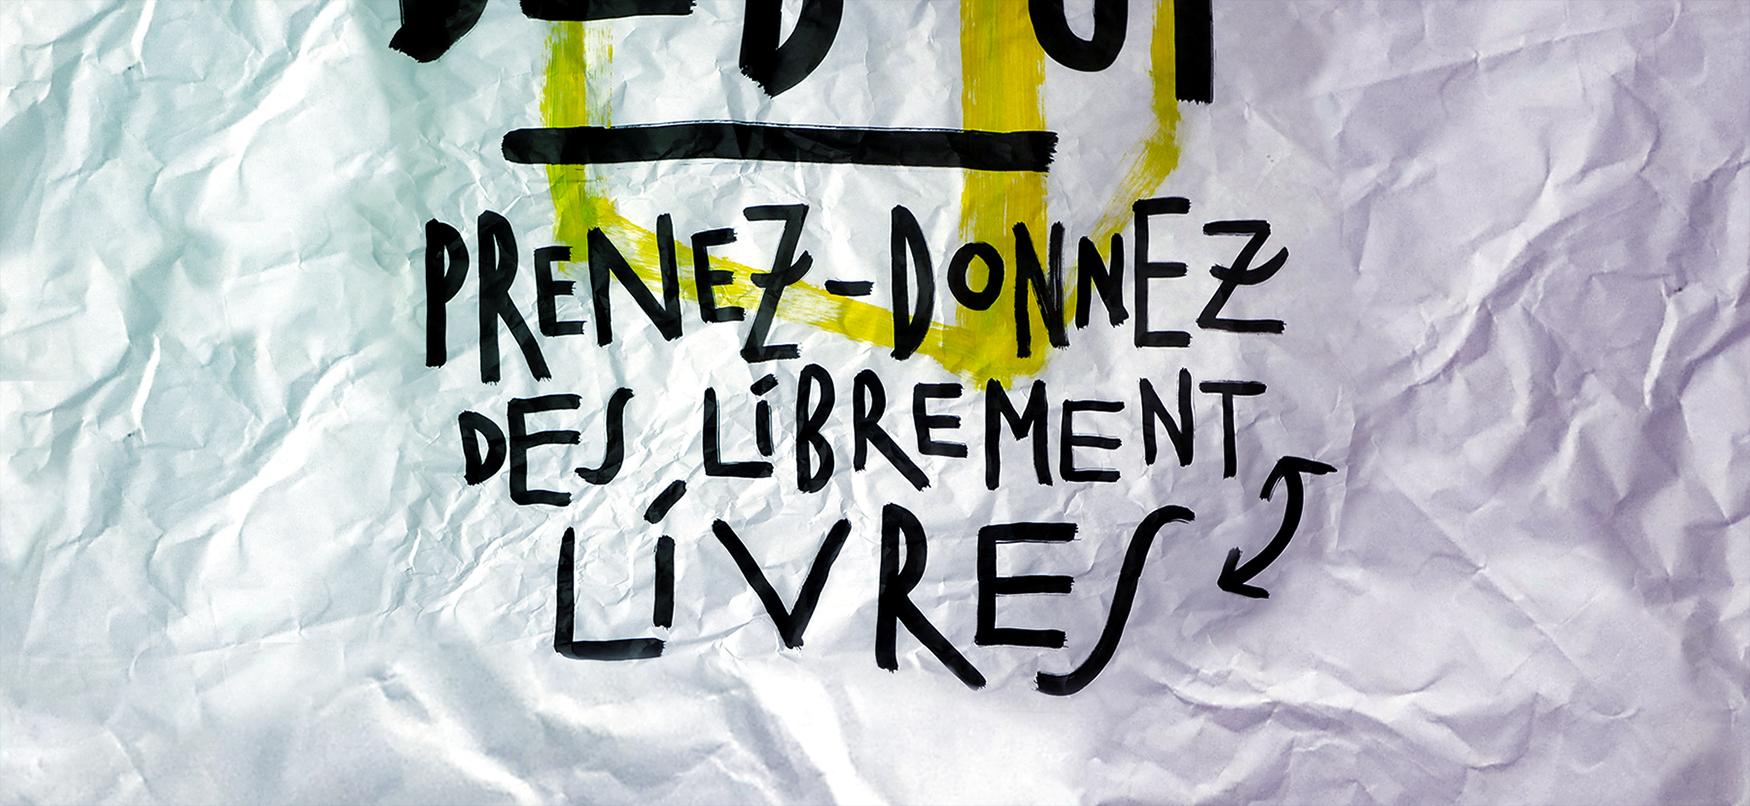 https://www.laquadrature.net/wp-content/uploads/sites/8/2020/05/librement.png